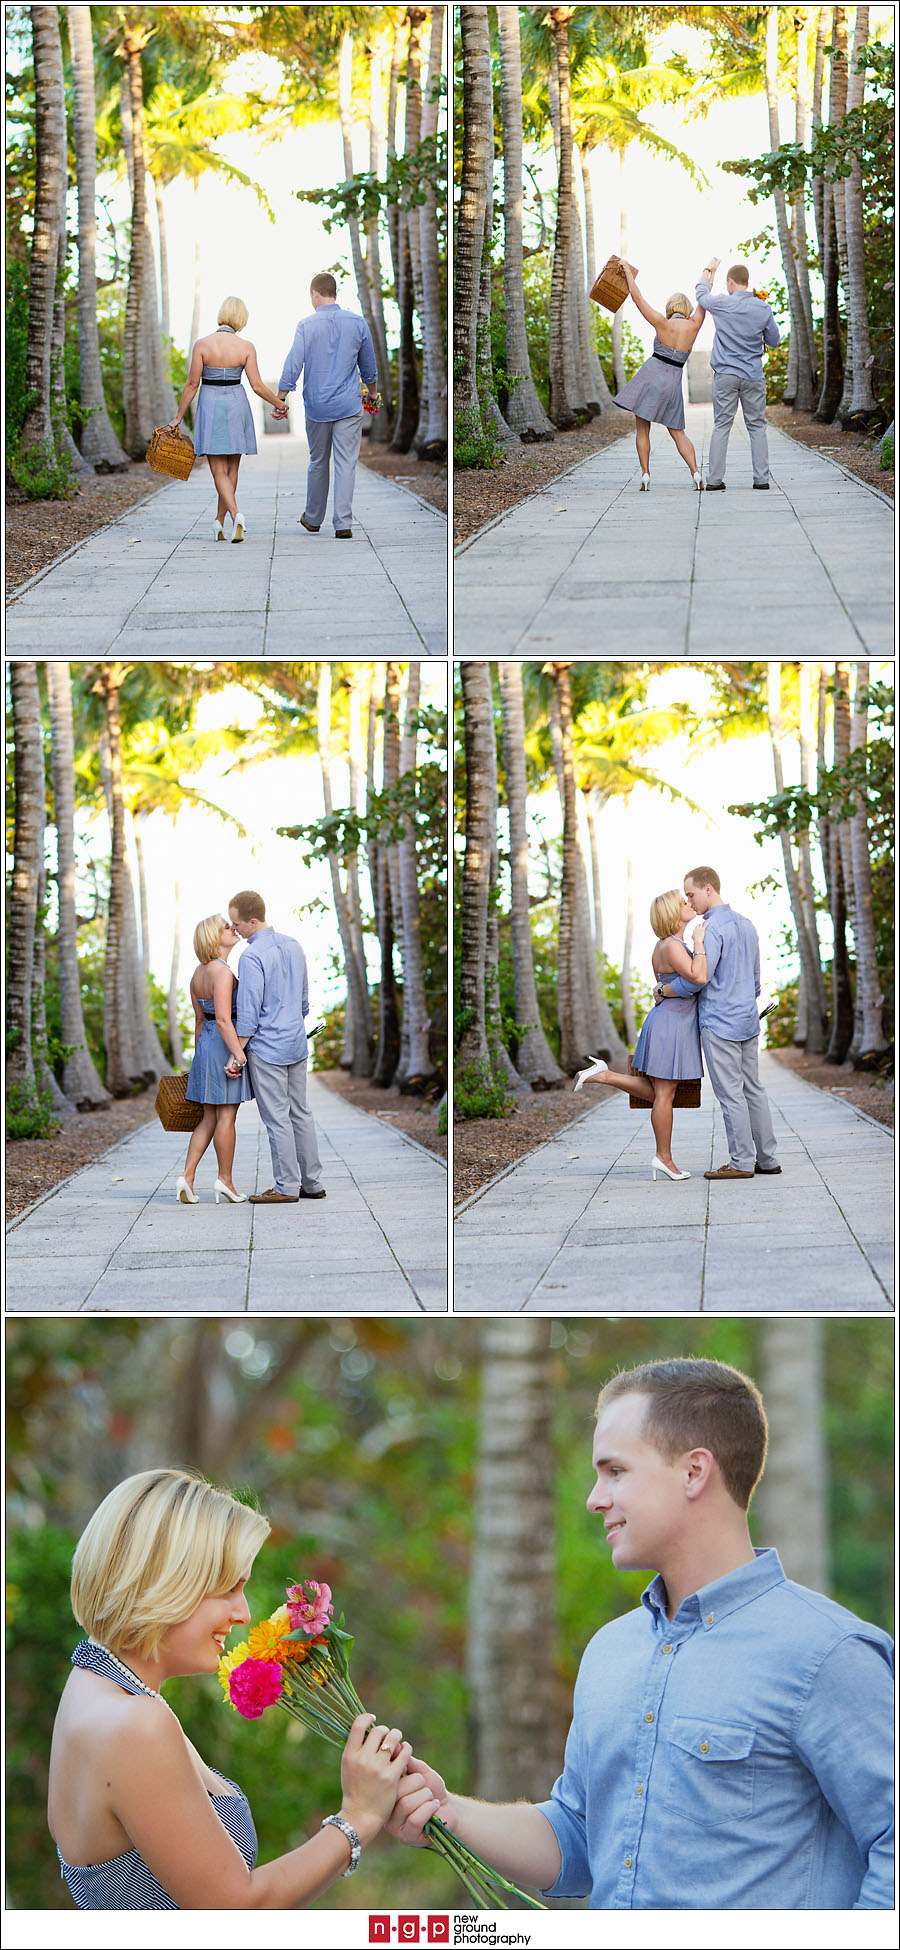 Is dating scene good for men in miami florida